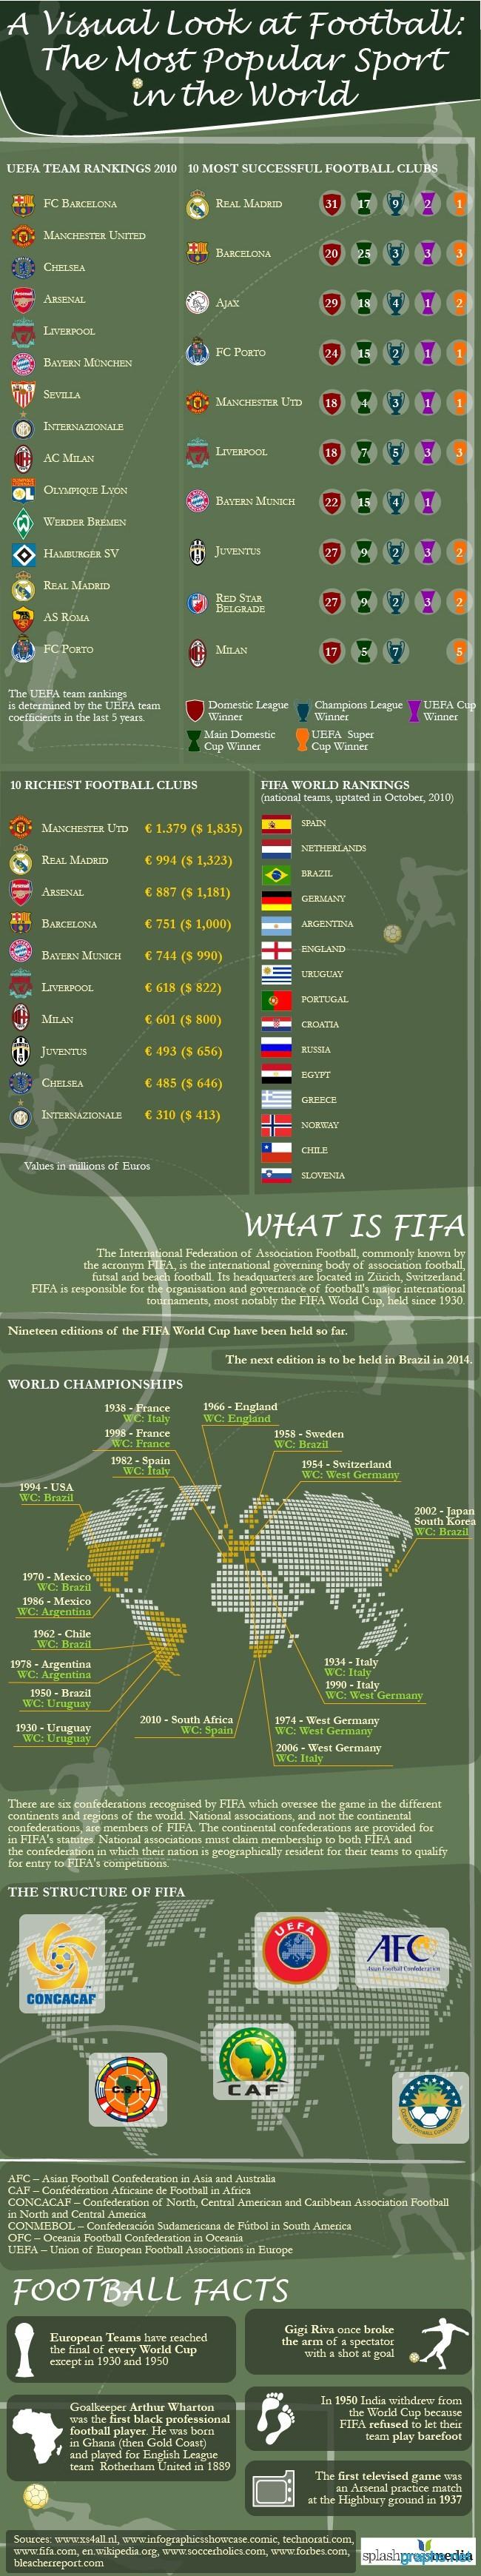 football history facts